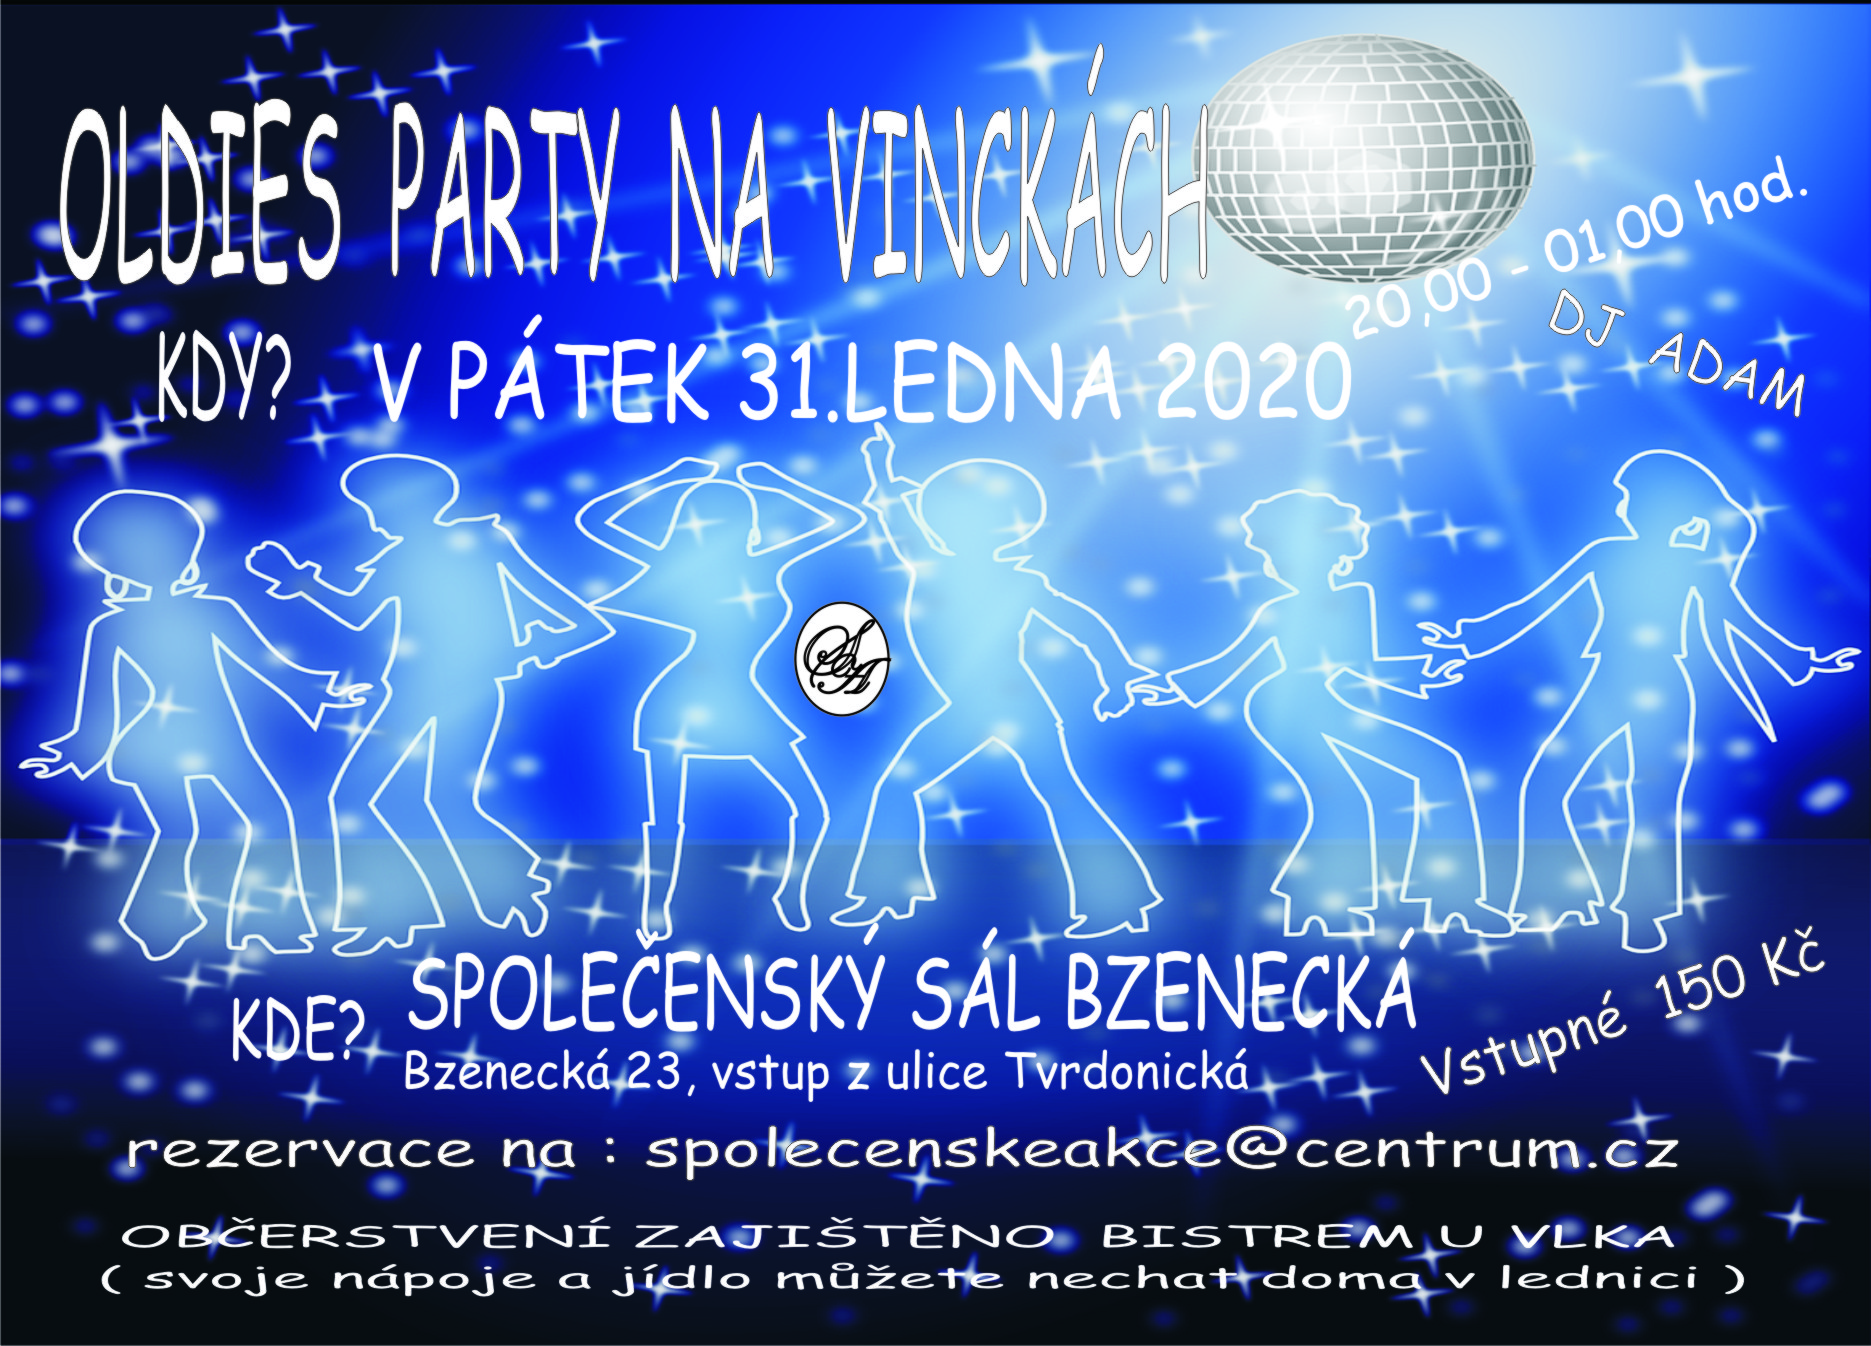 OLDIES PARTY NA VINCKÁCH